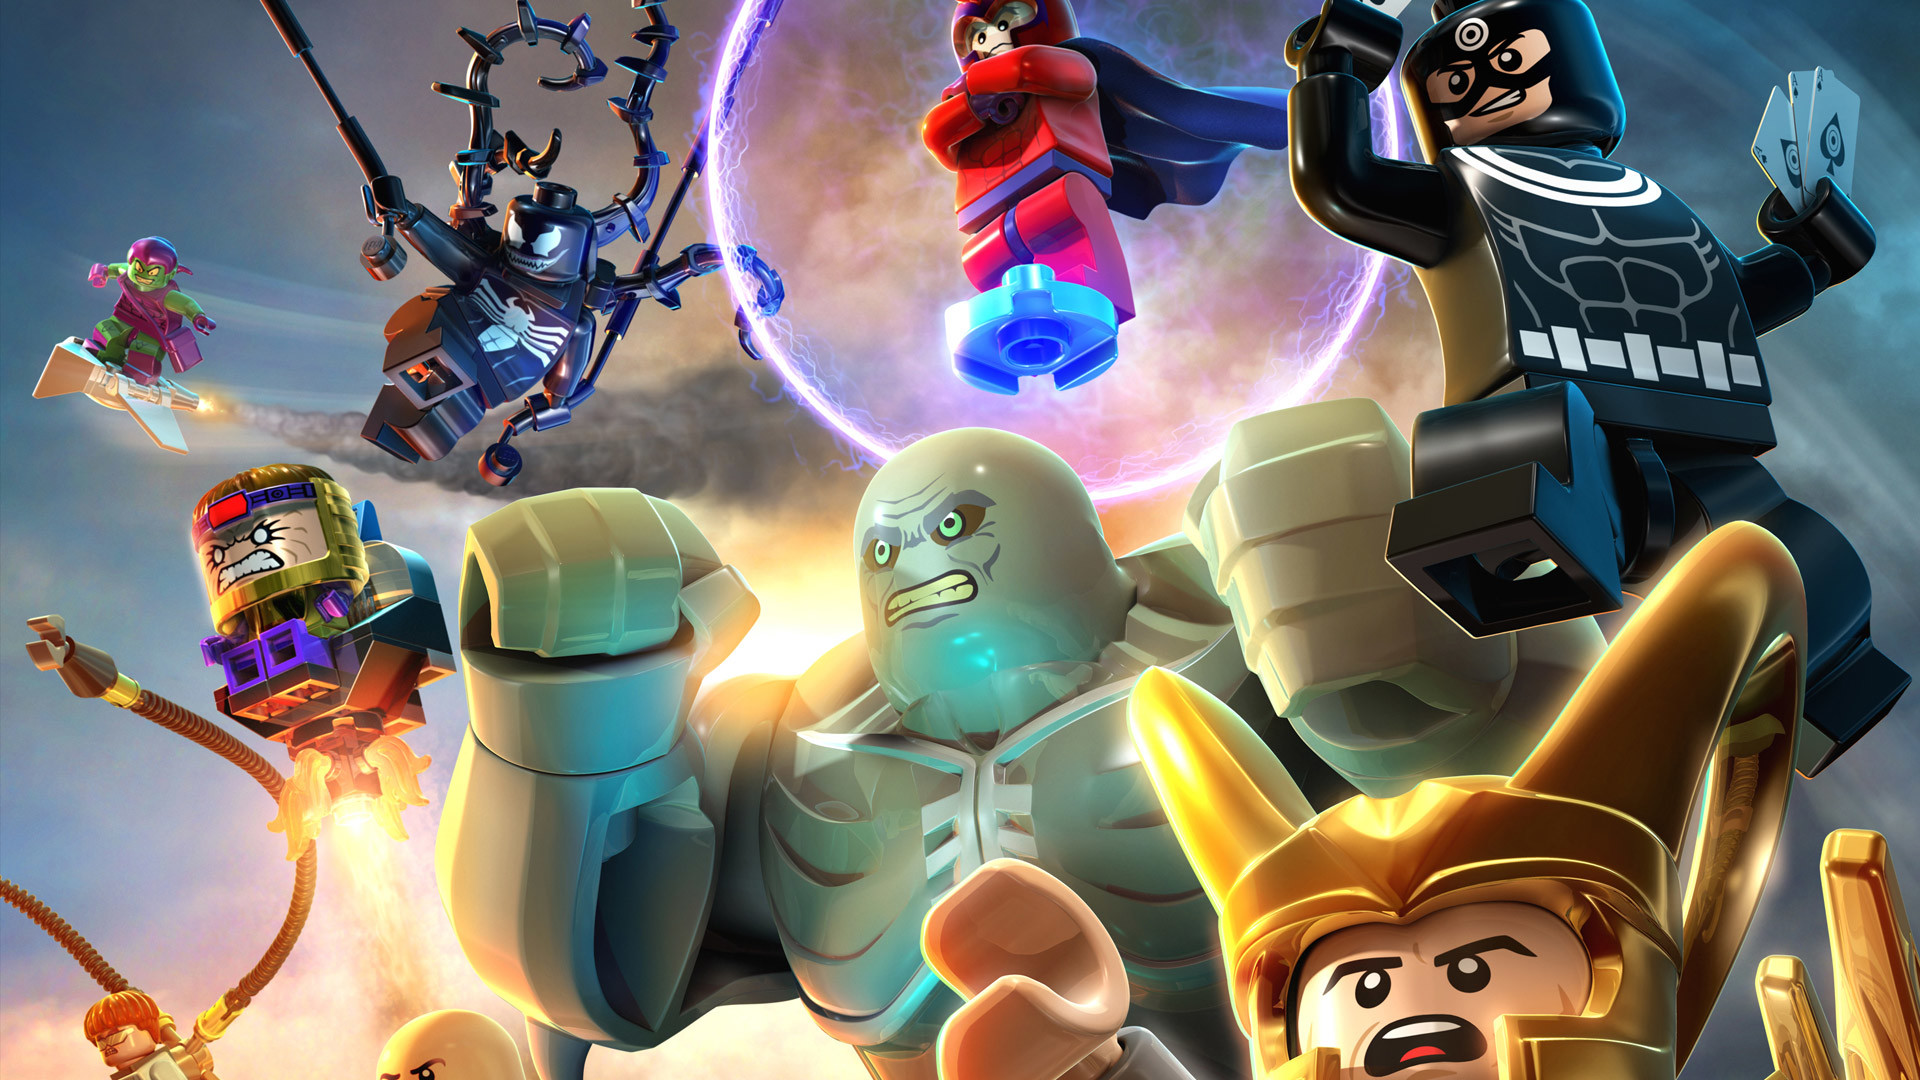 Lego Superheroes Wallpaper 70 Images